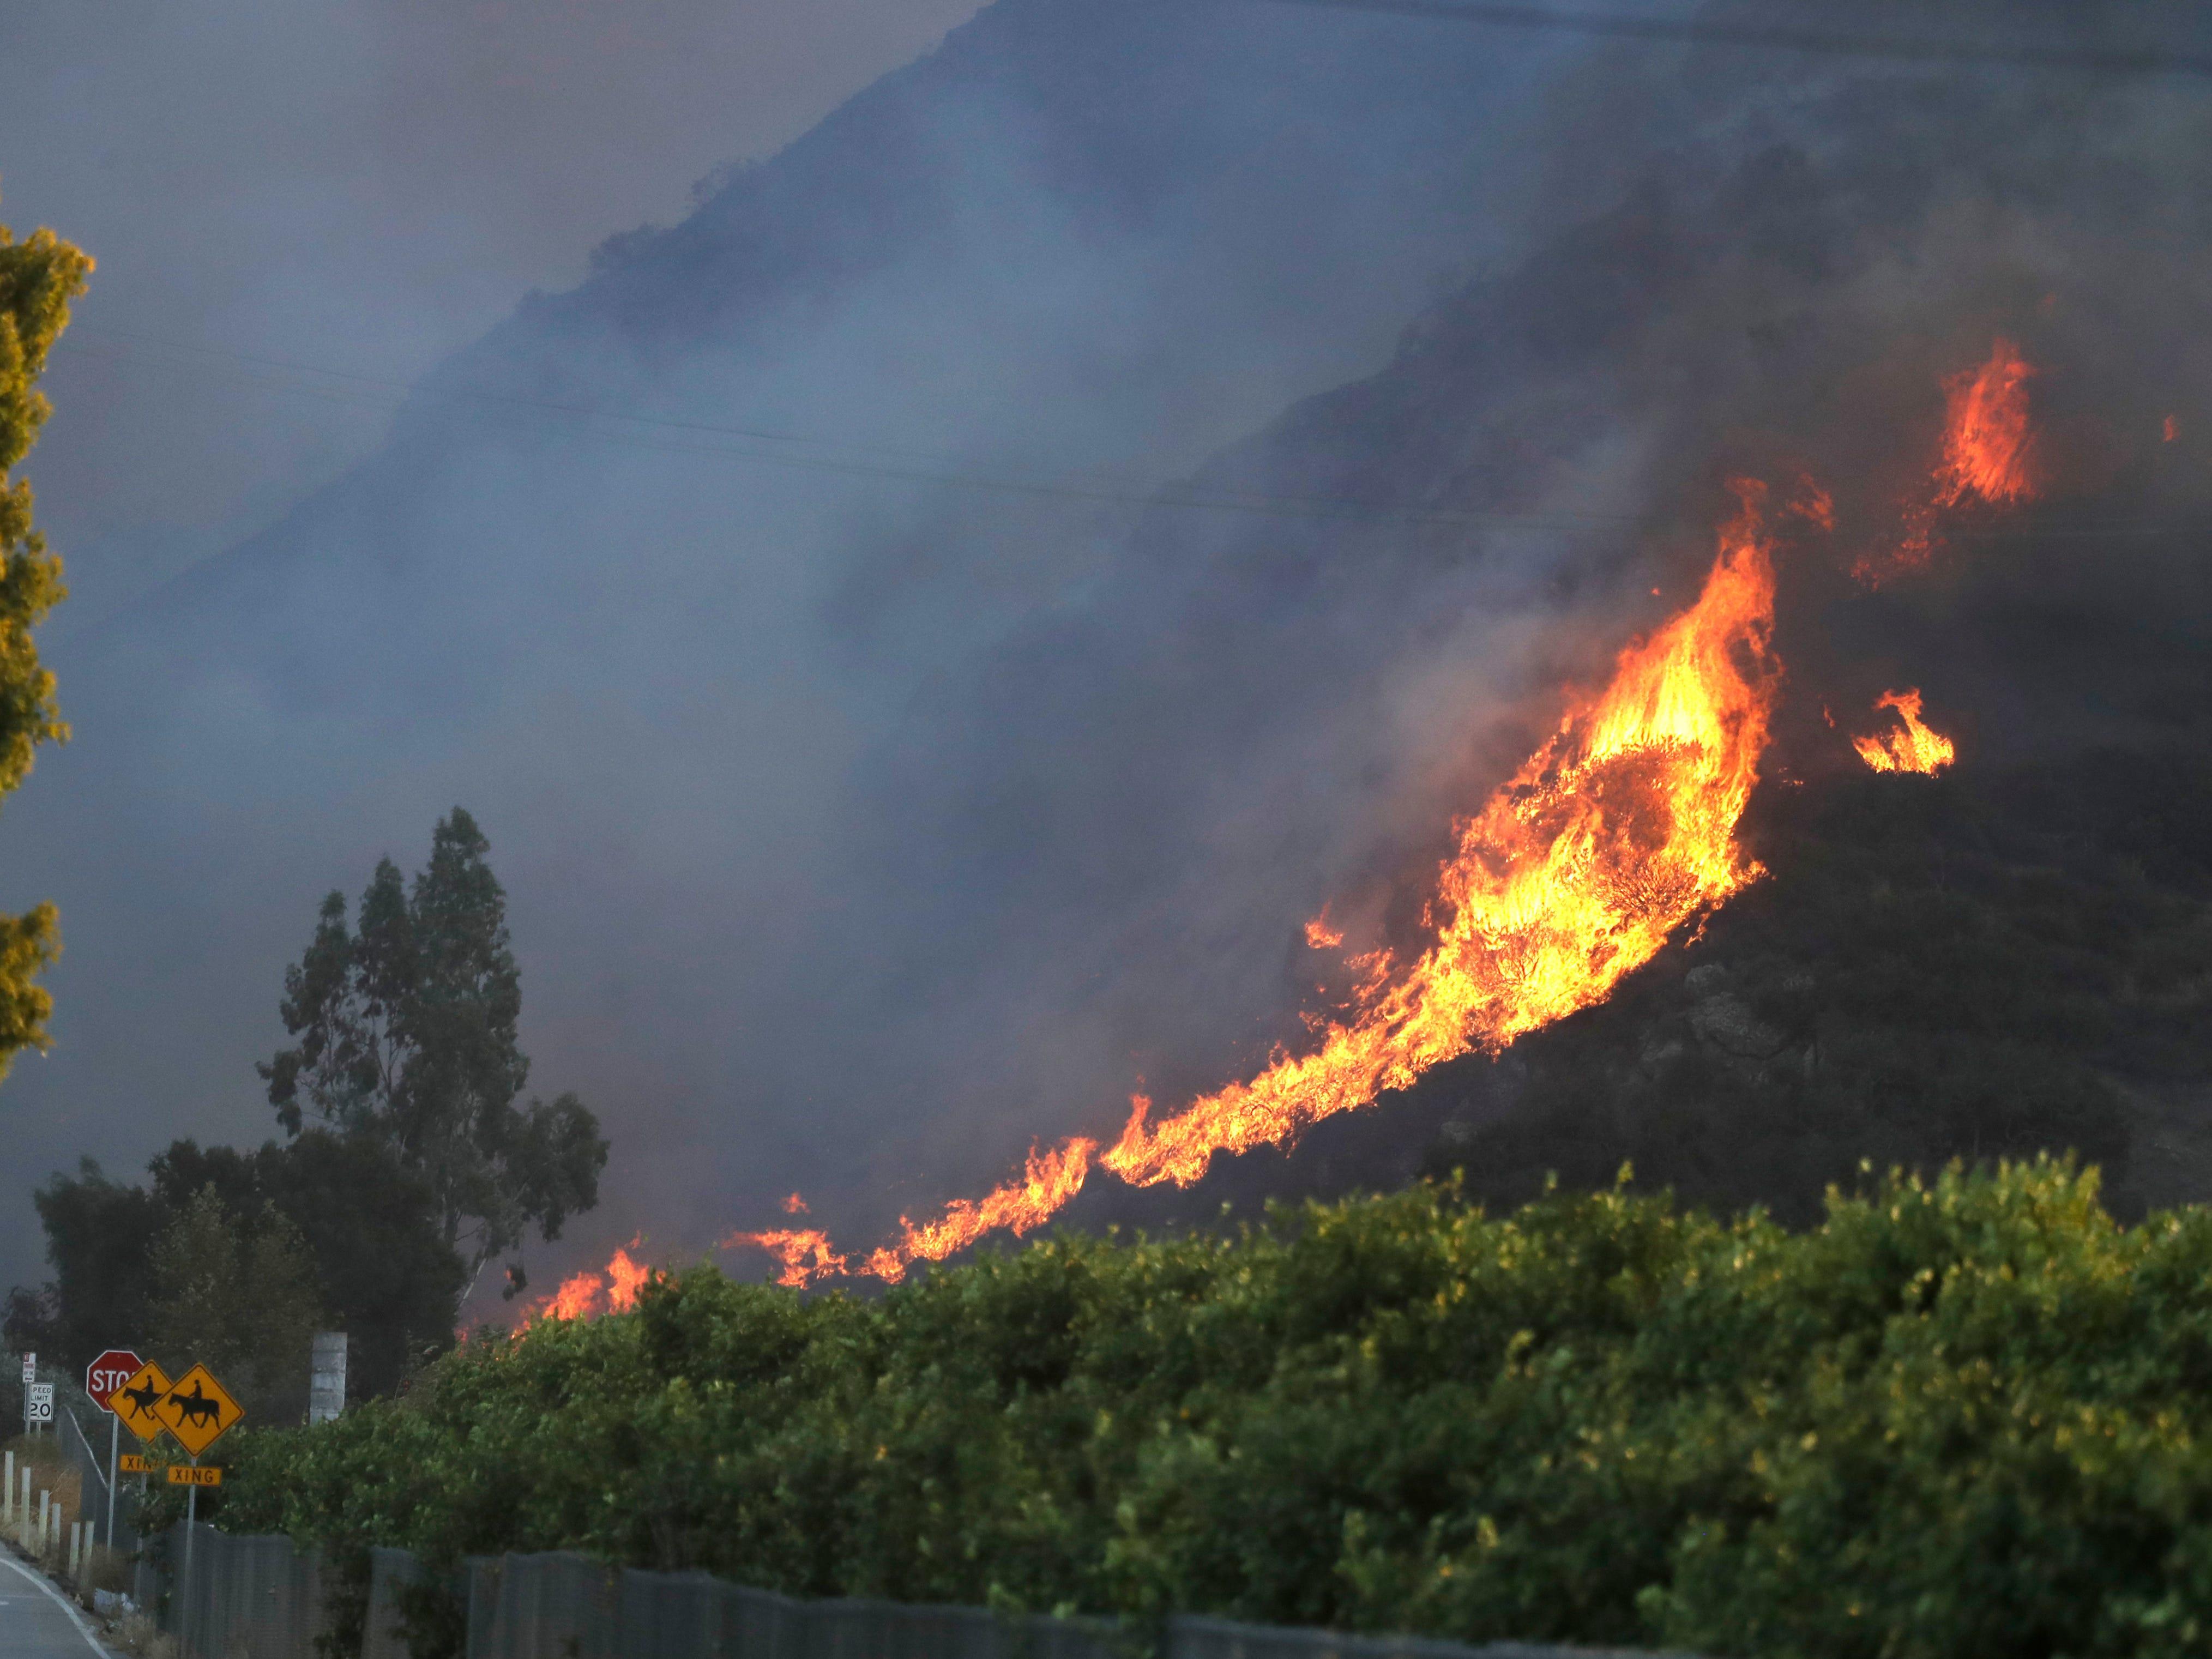 A wildfire burns on Nov. 8, 2018, near Newbury Park, Calif.